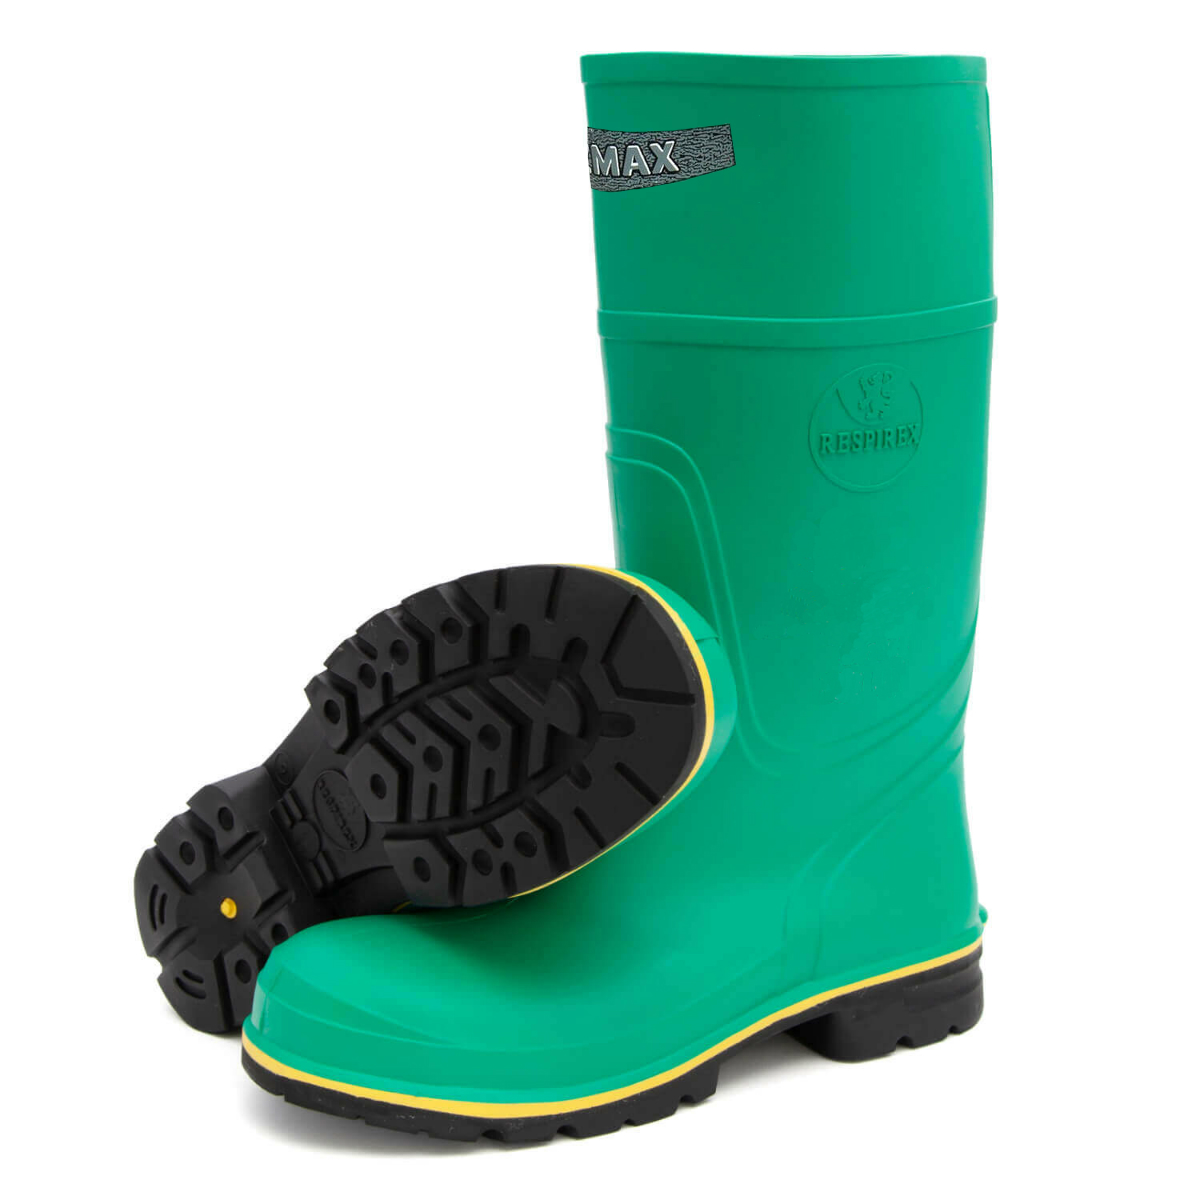 fd887349abc Respirex Hazmax Chemical Resistant Biological Hazard Steel Toe Cap Safety  Wellingtons Boots